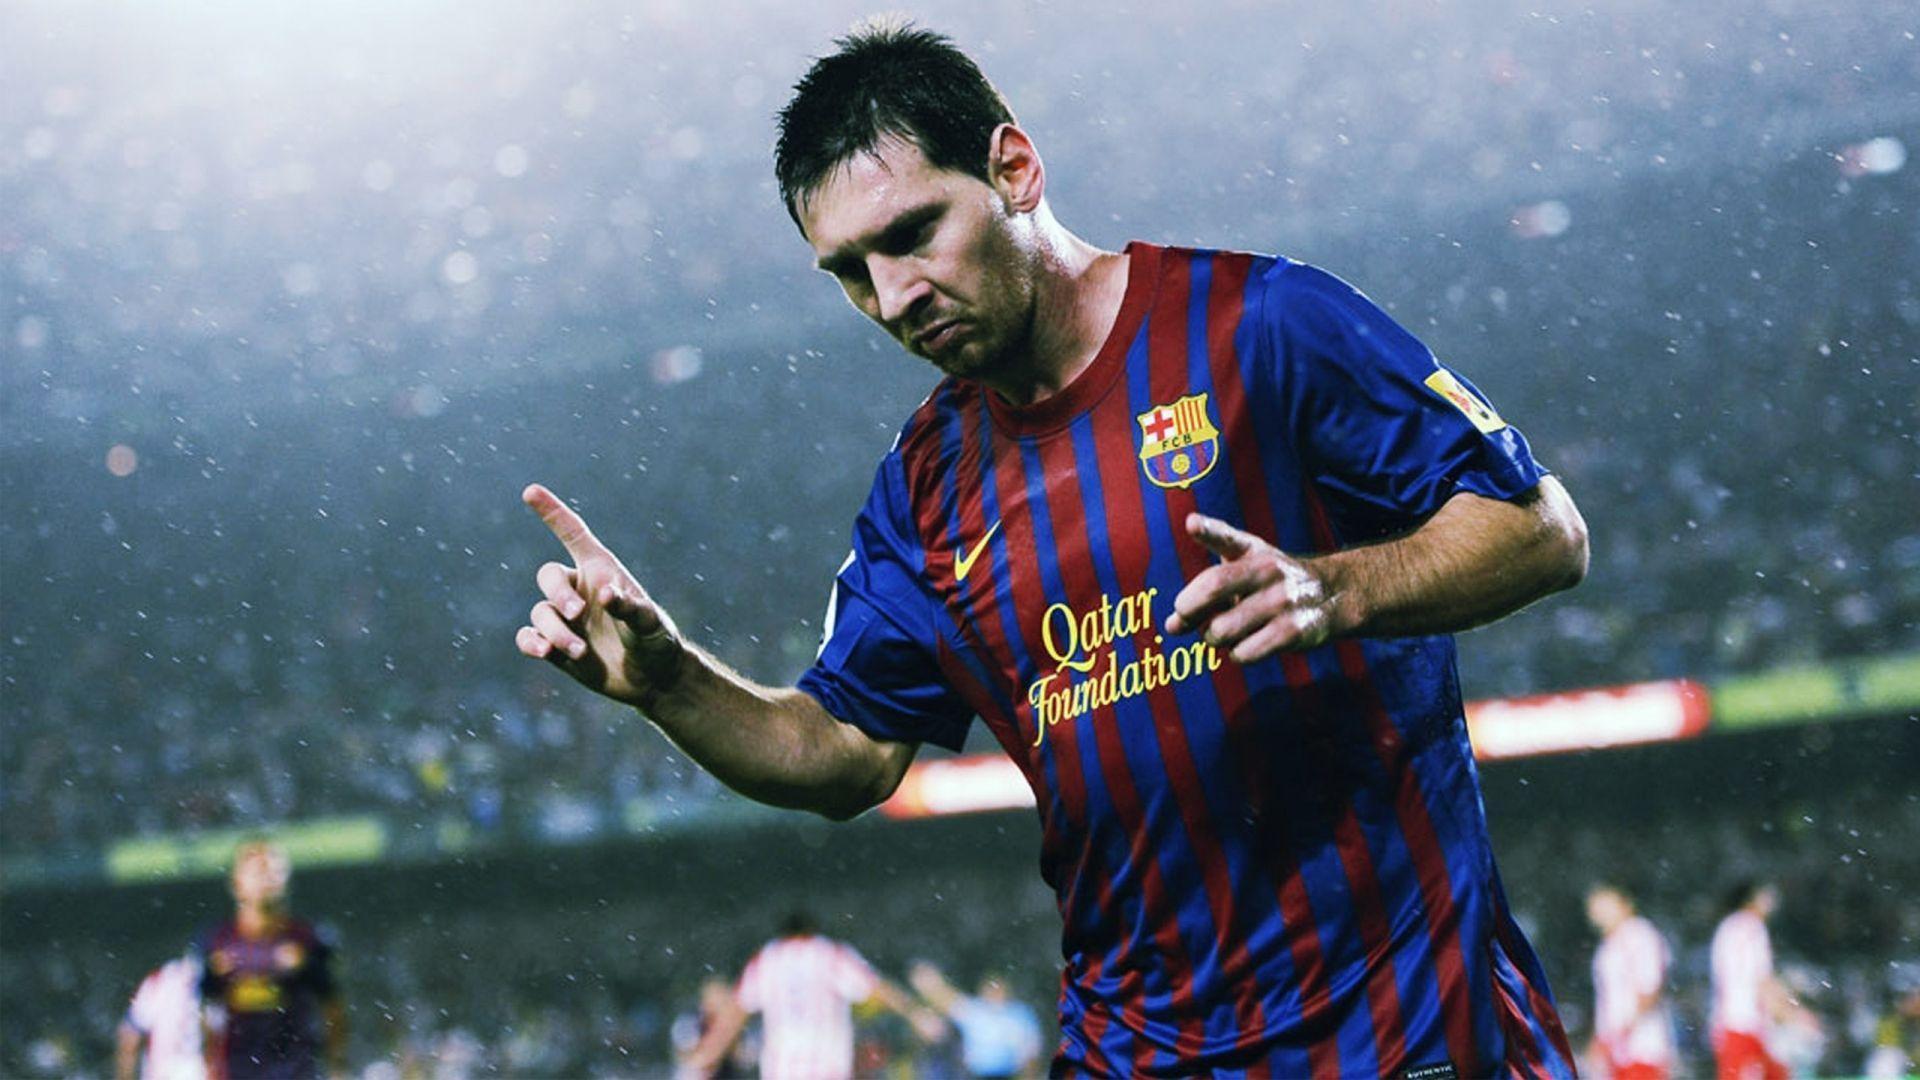 Leo Messi 2013 Desktop Background Wallpaper 1920x1080 | Hot HD ...